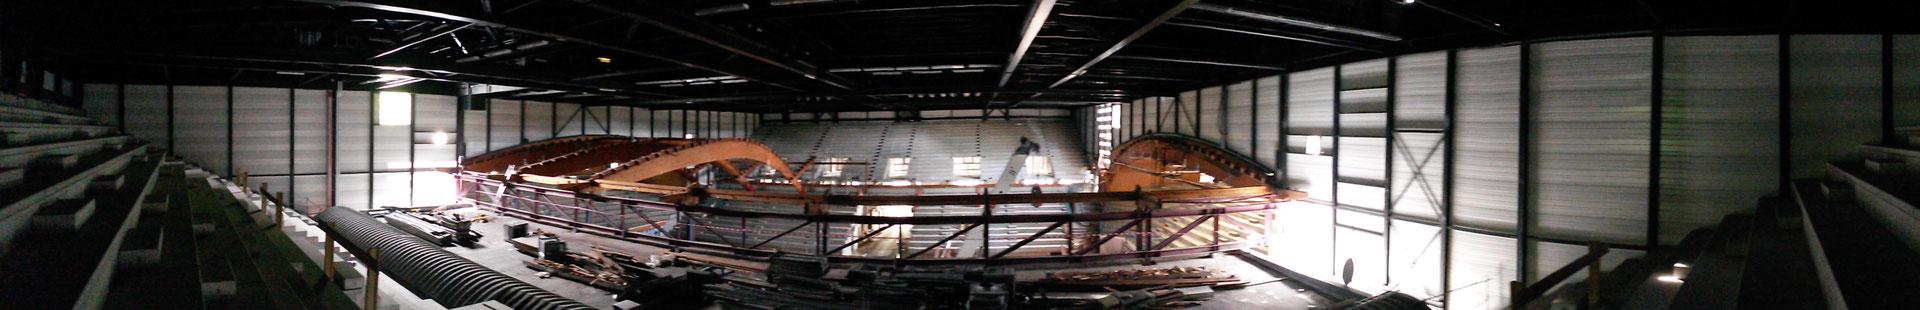 Palais des sports du PRADO - BOURGES (18)